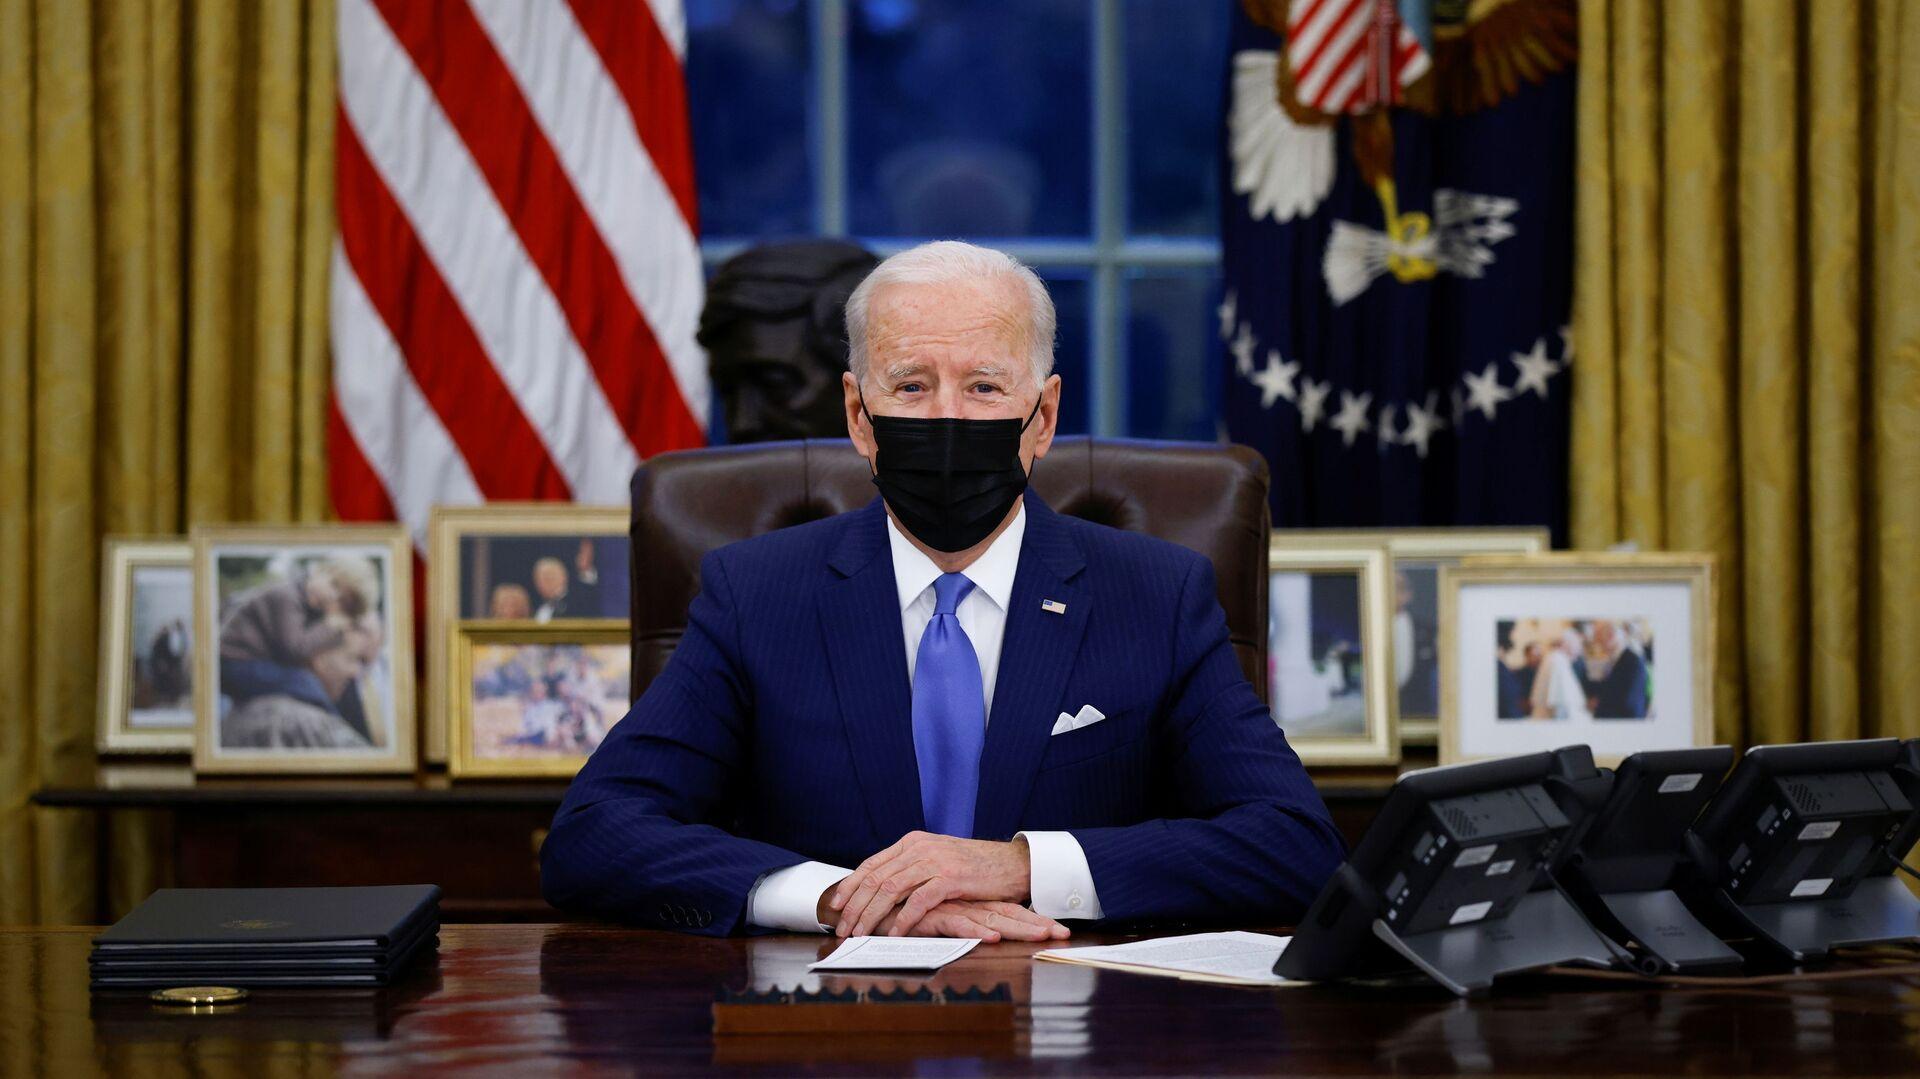 Joe Biden, presidente de EEUU - Sputnik Mundo, 1920, 08.02.2021